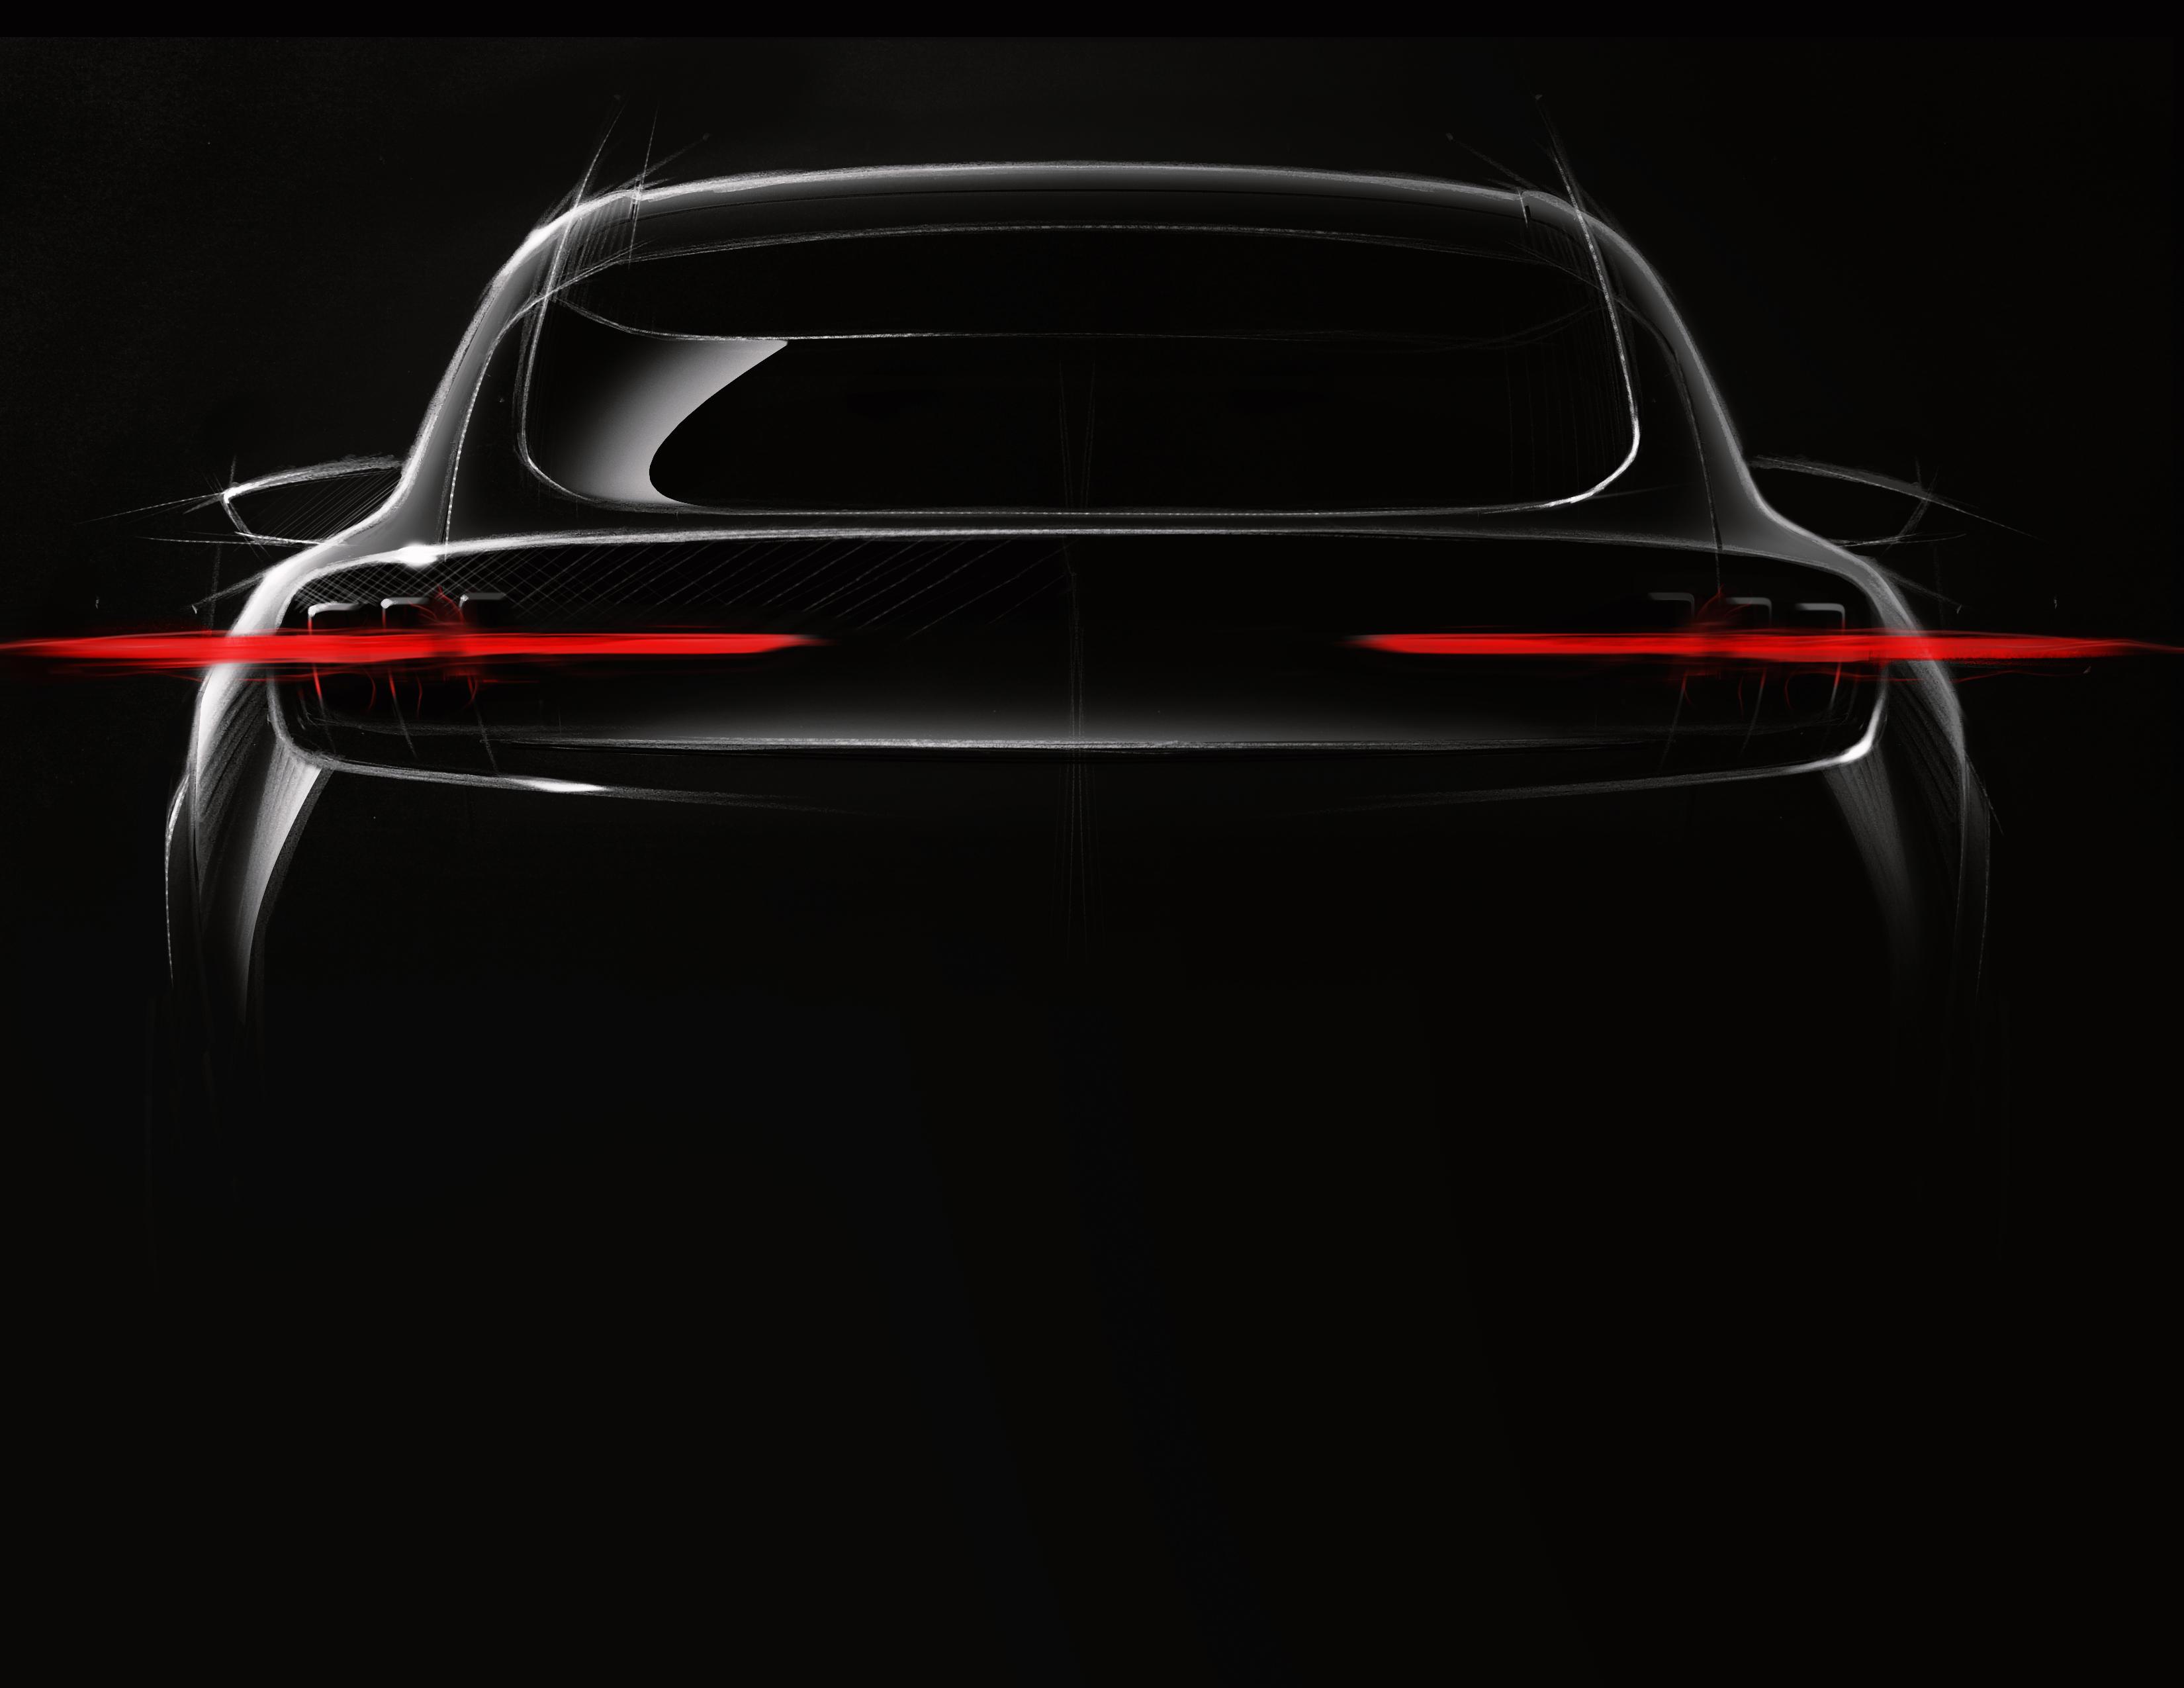 Ford enthüllt erstes Teaser-Bild eines neuen Elektrofahrzeugs